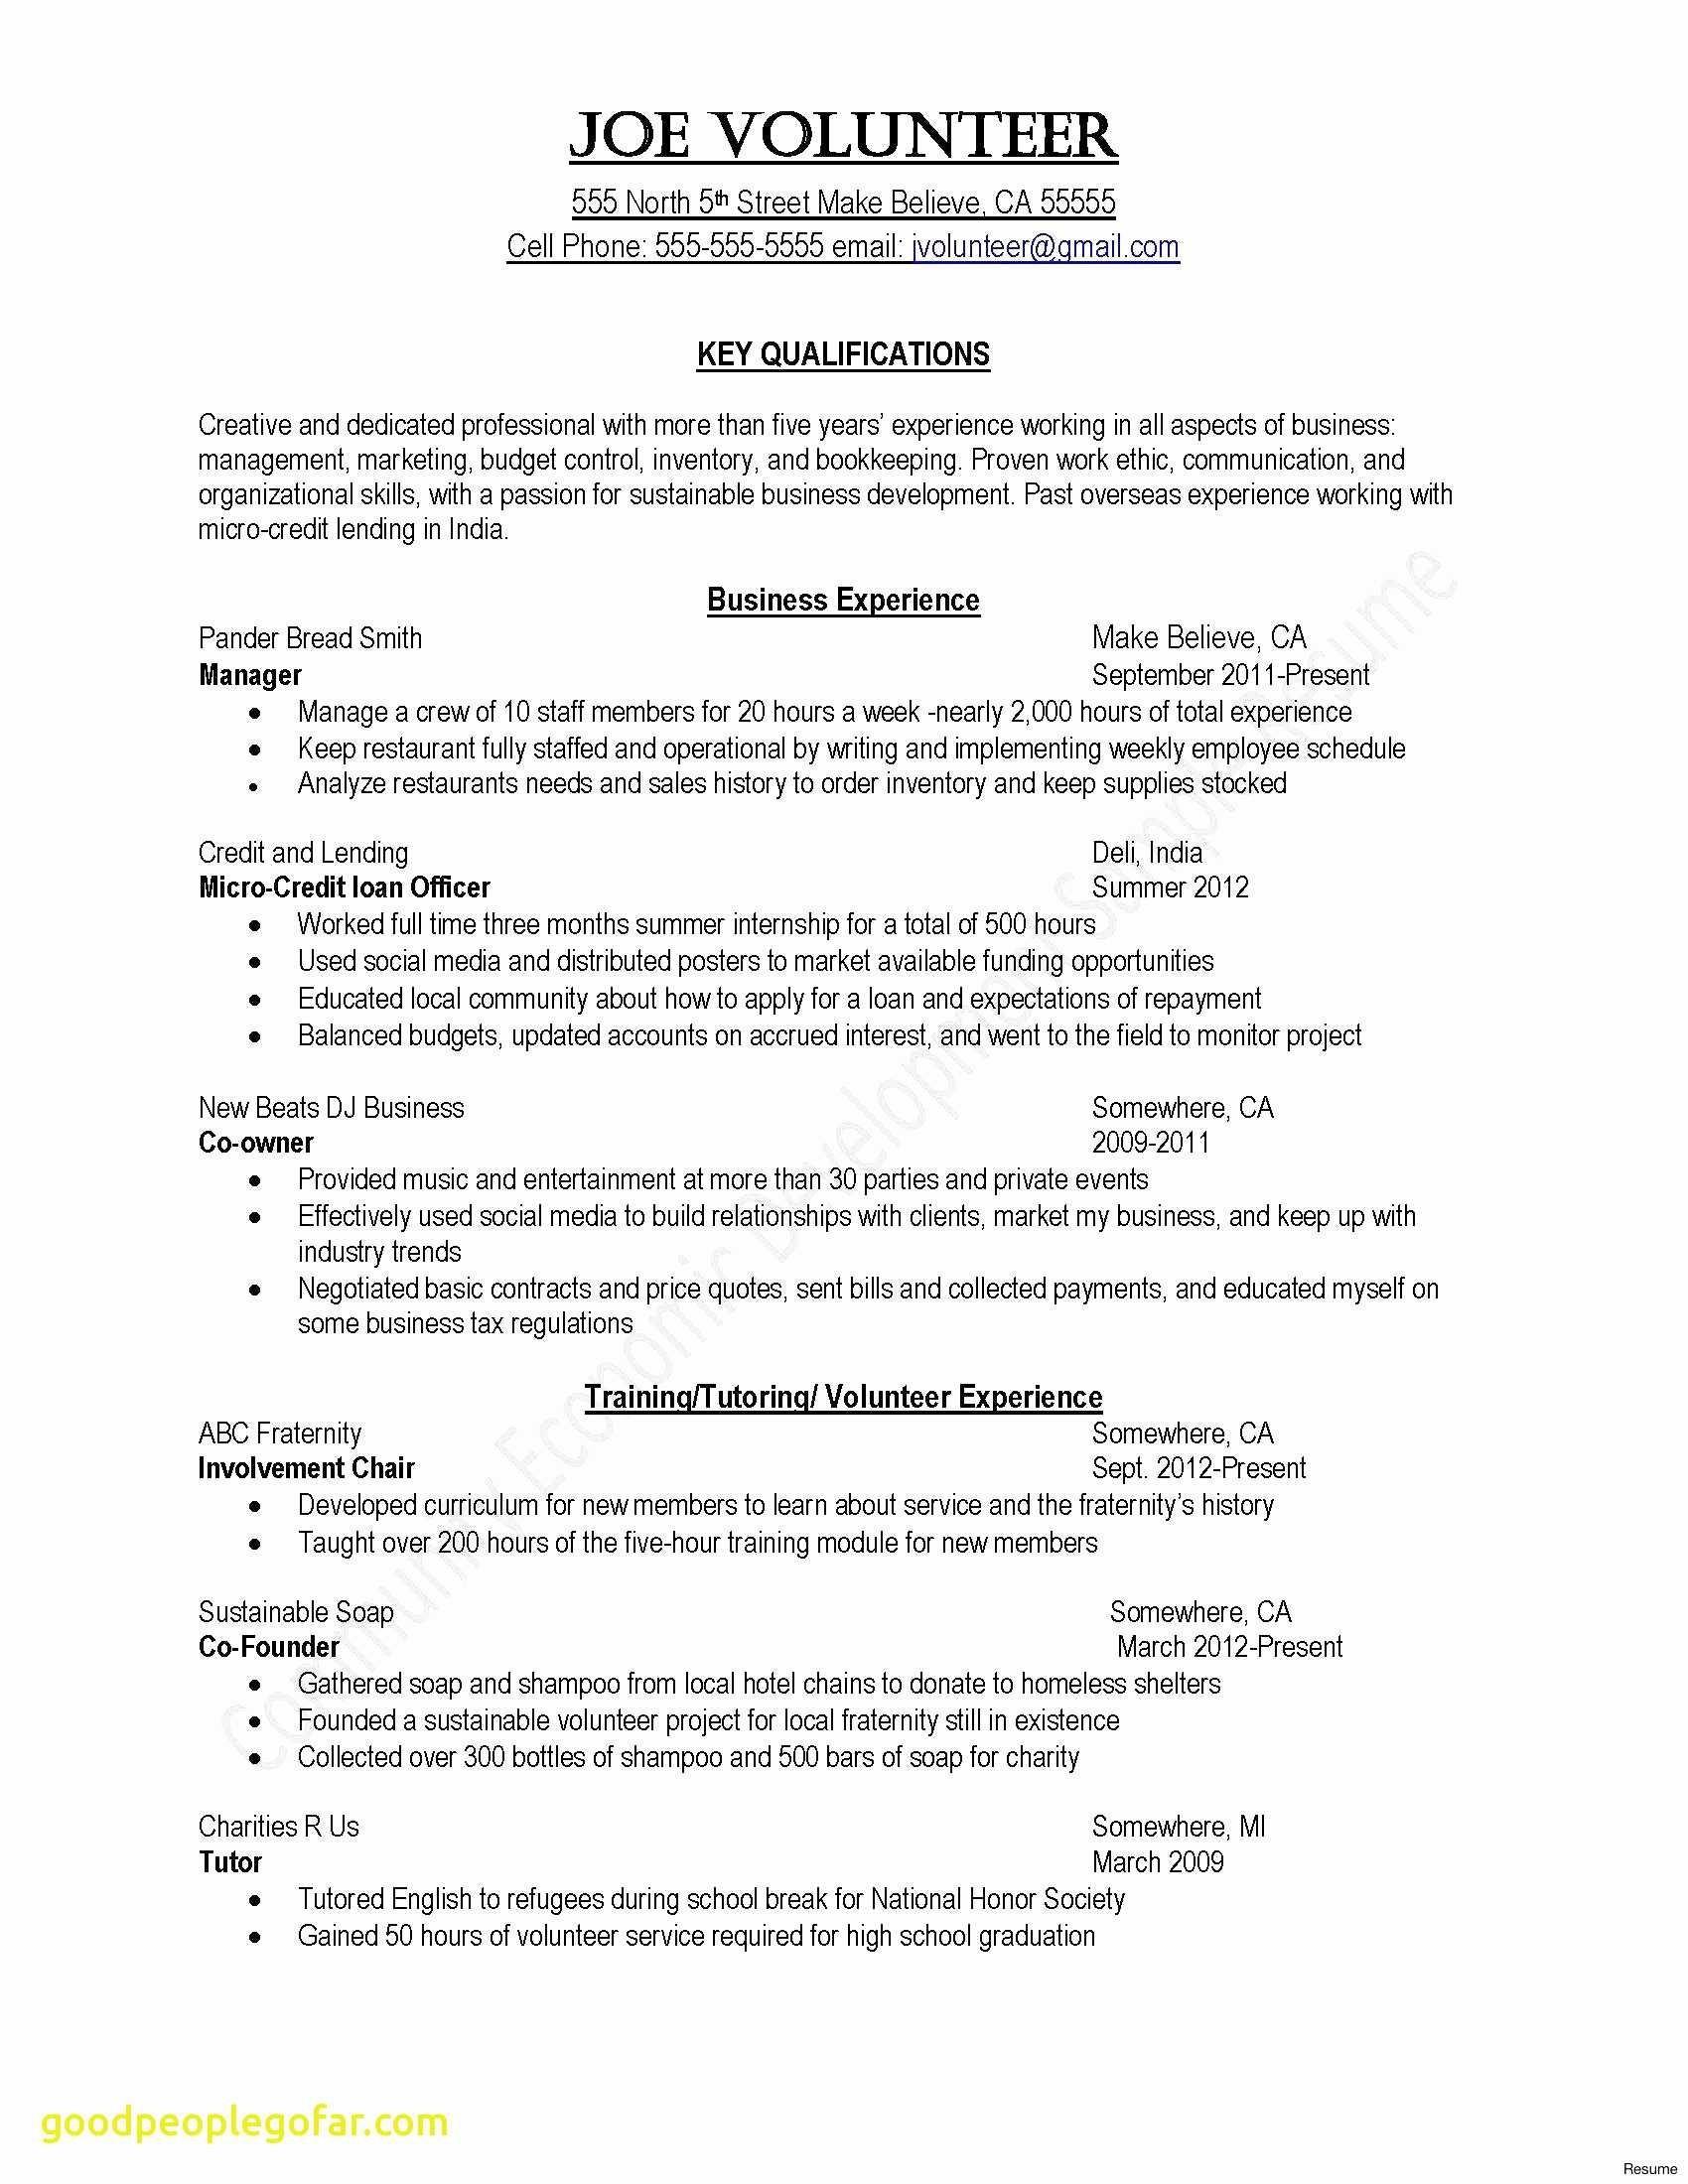 Verification Letter Template - Sample Job Verification Letter Valid Best Sample College